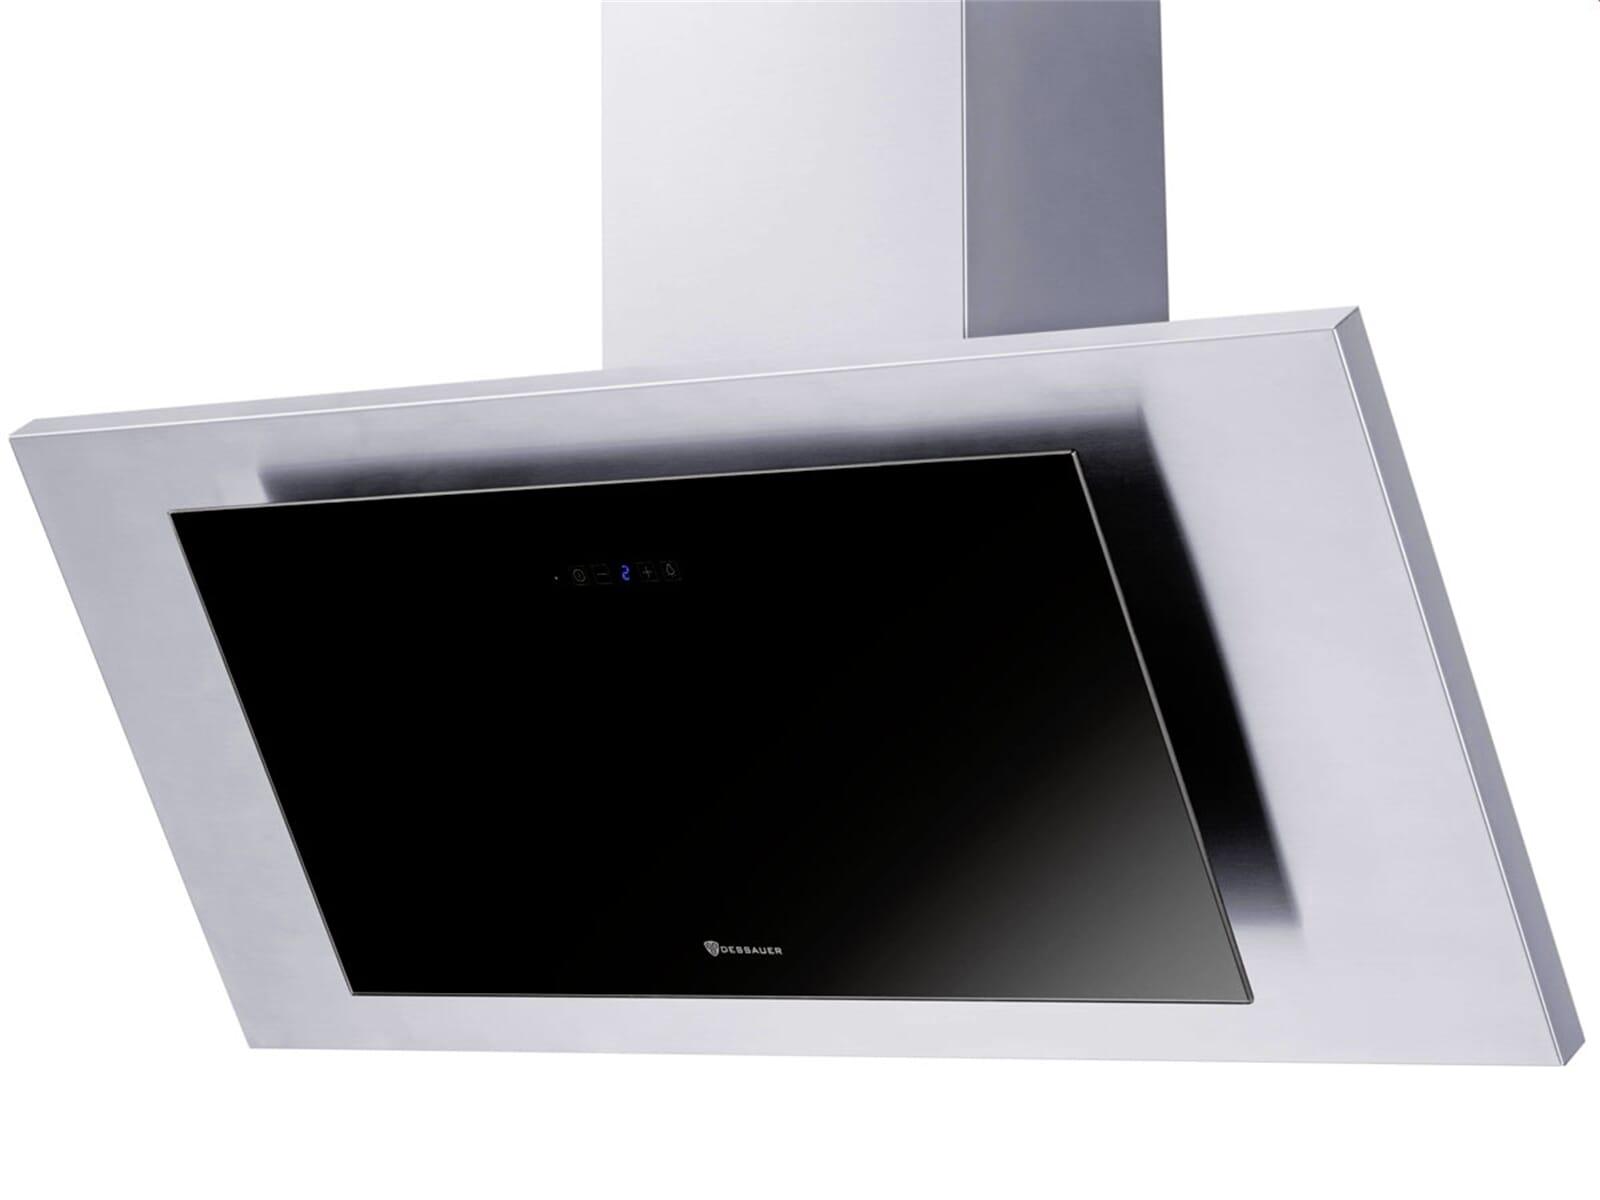 dessauer boria 90 e 9954 91 kopffreihaube edelstahl schwarz. Black Bedroom Furniture Sets. Home Design Ideas